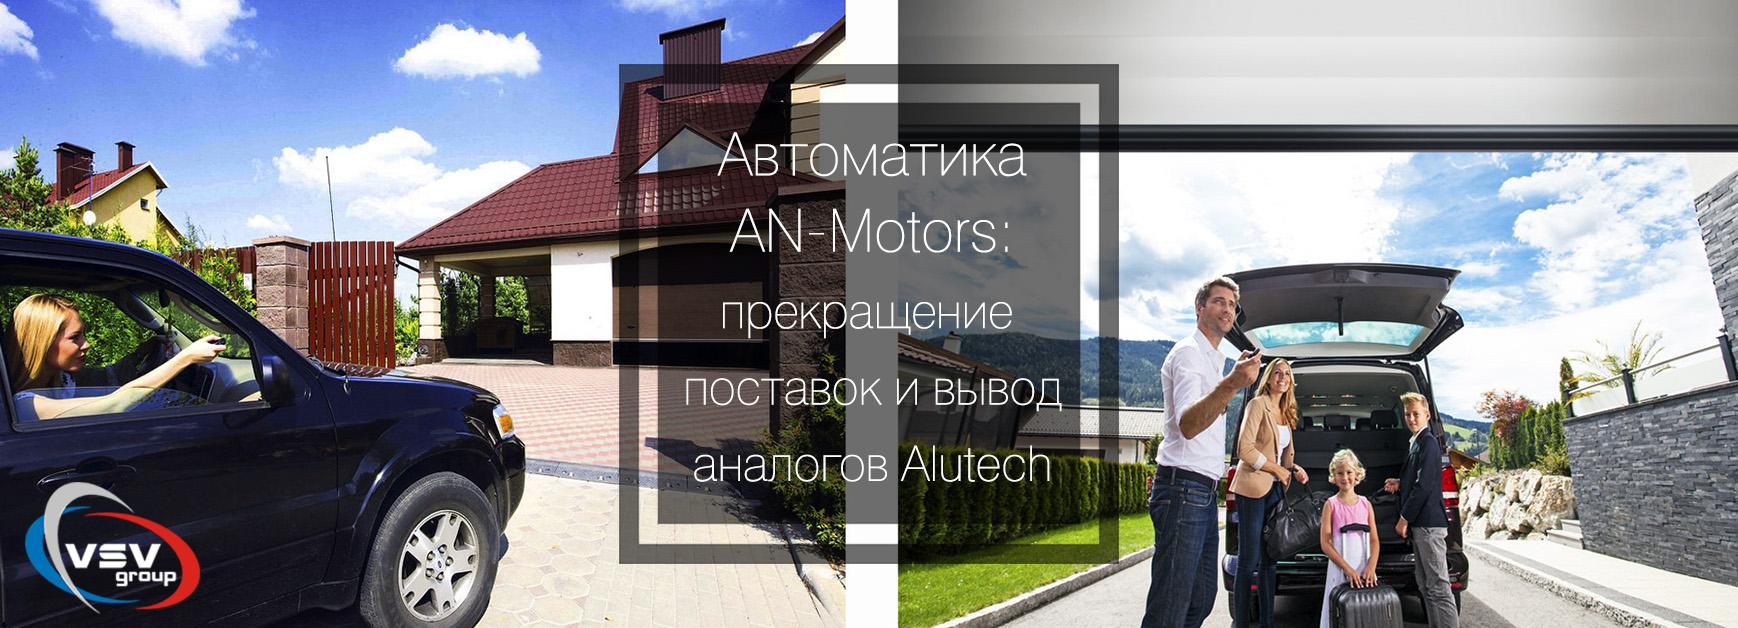 avtomatika-an-motors-1